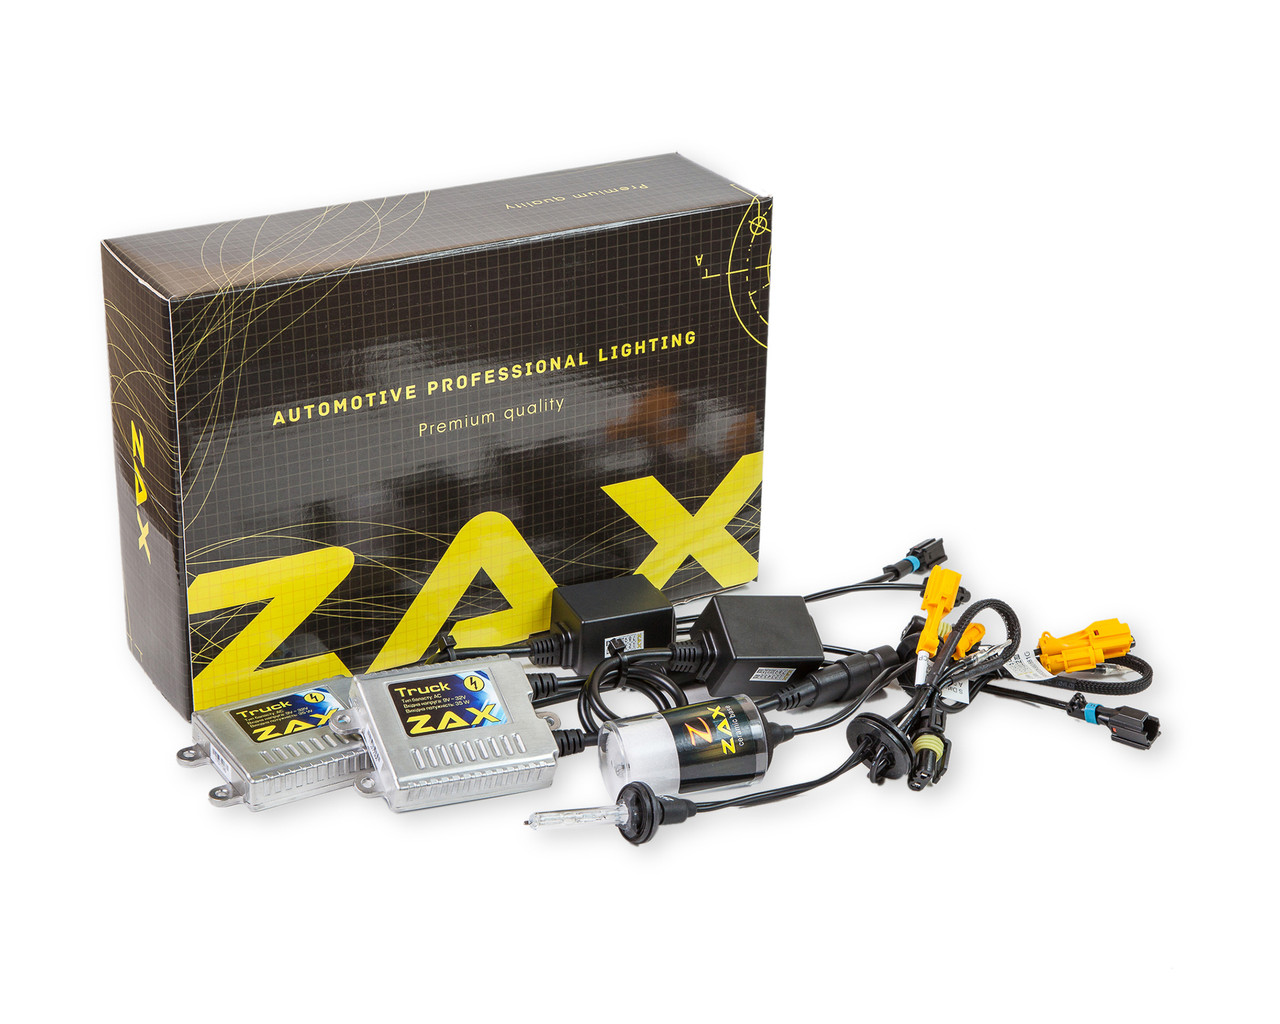 Комплект ксенона ZAX Truck 35W 9-32V H27 (880/881) Ceramic 6000K